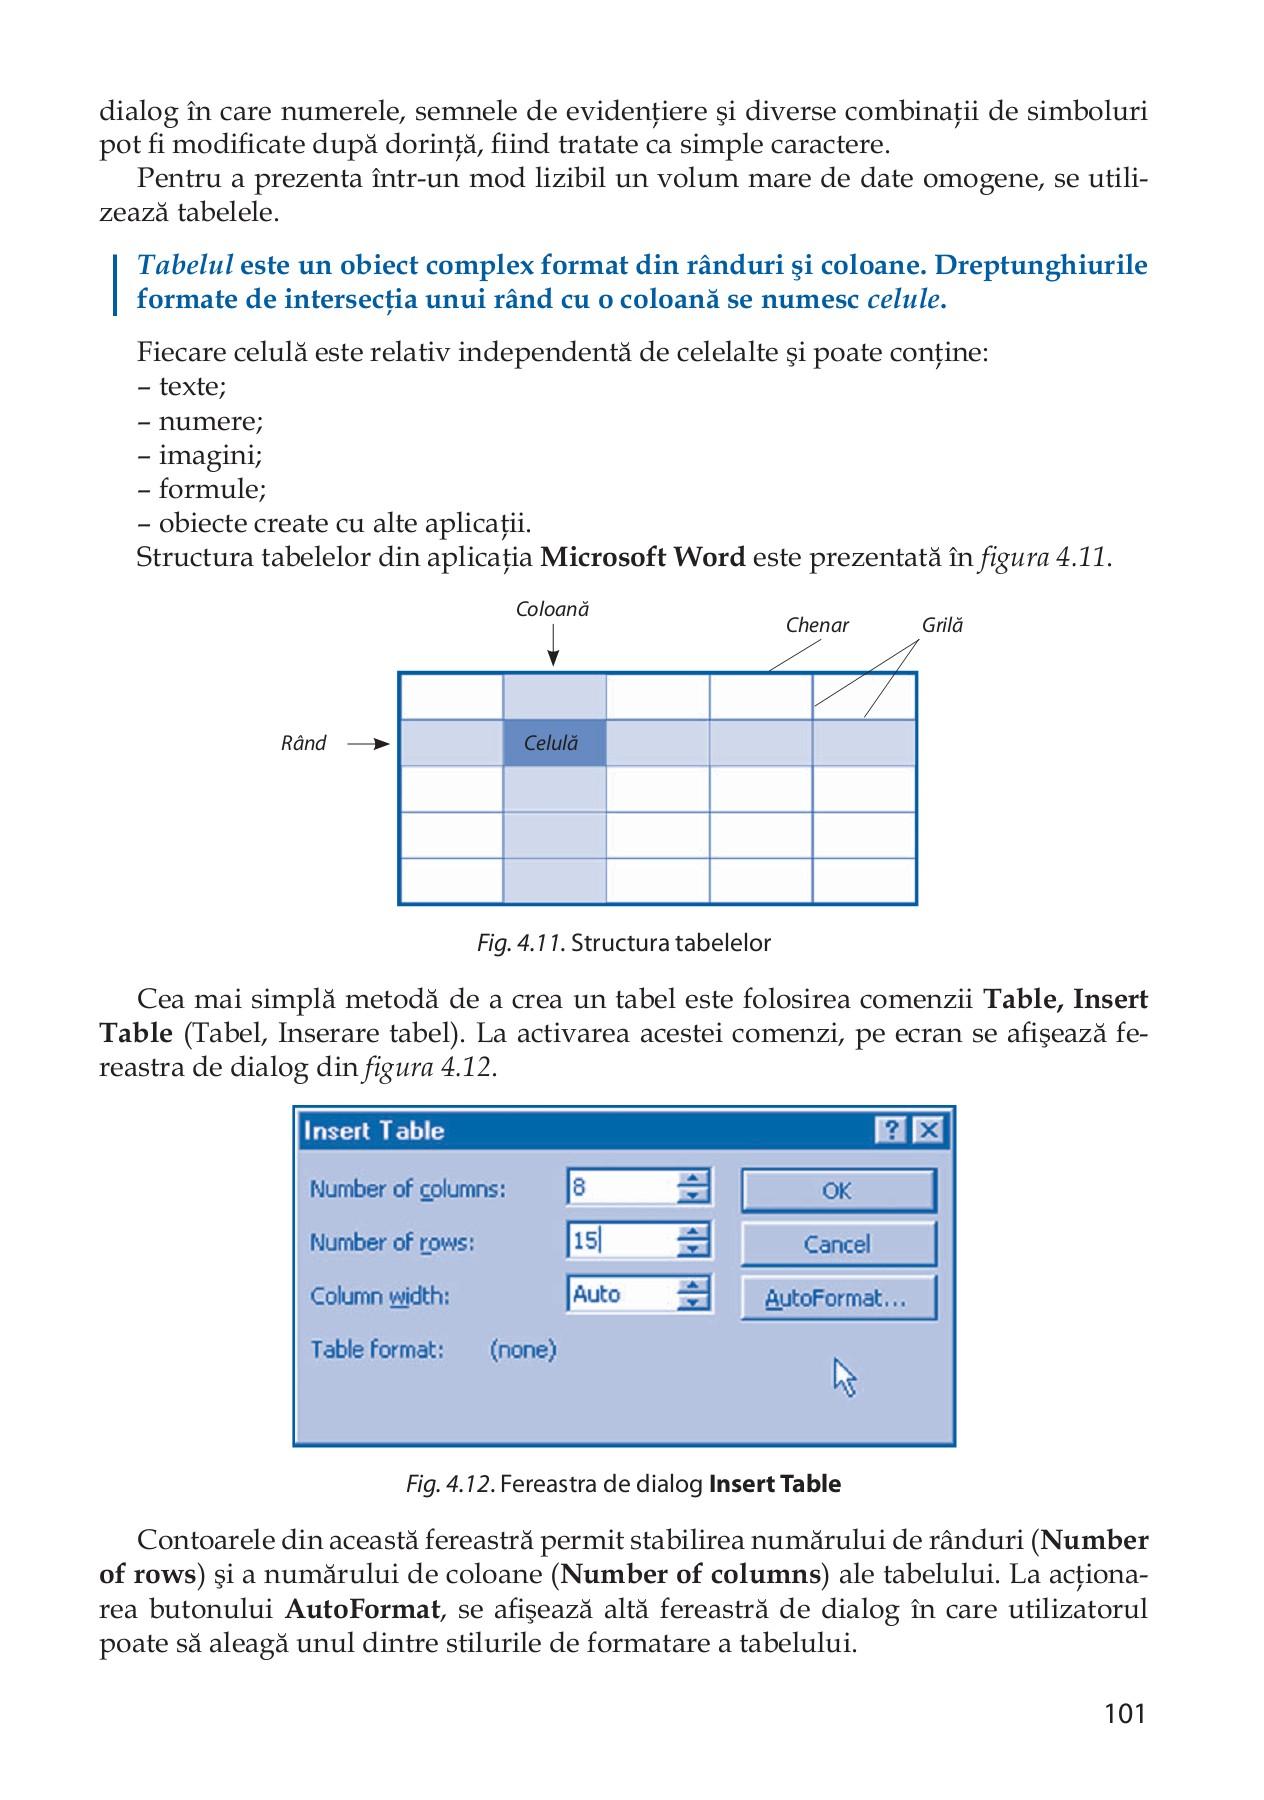 vizualizați tabelul cu scrisori